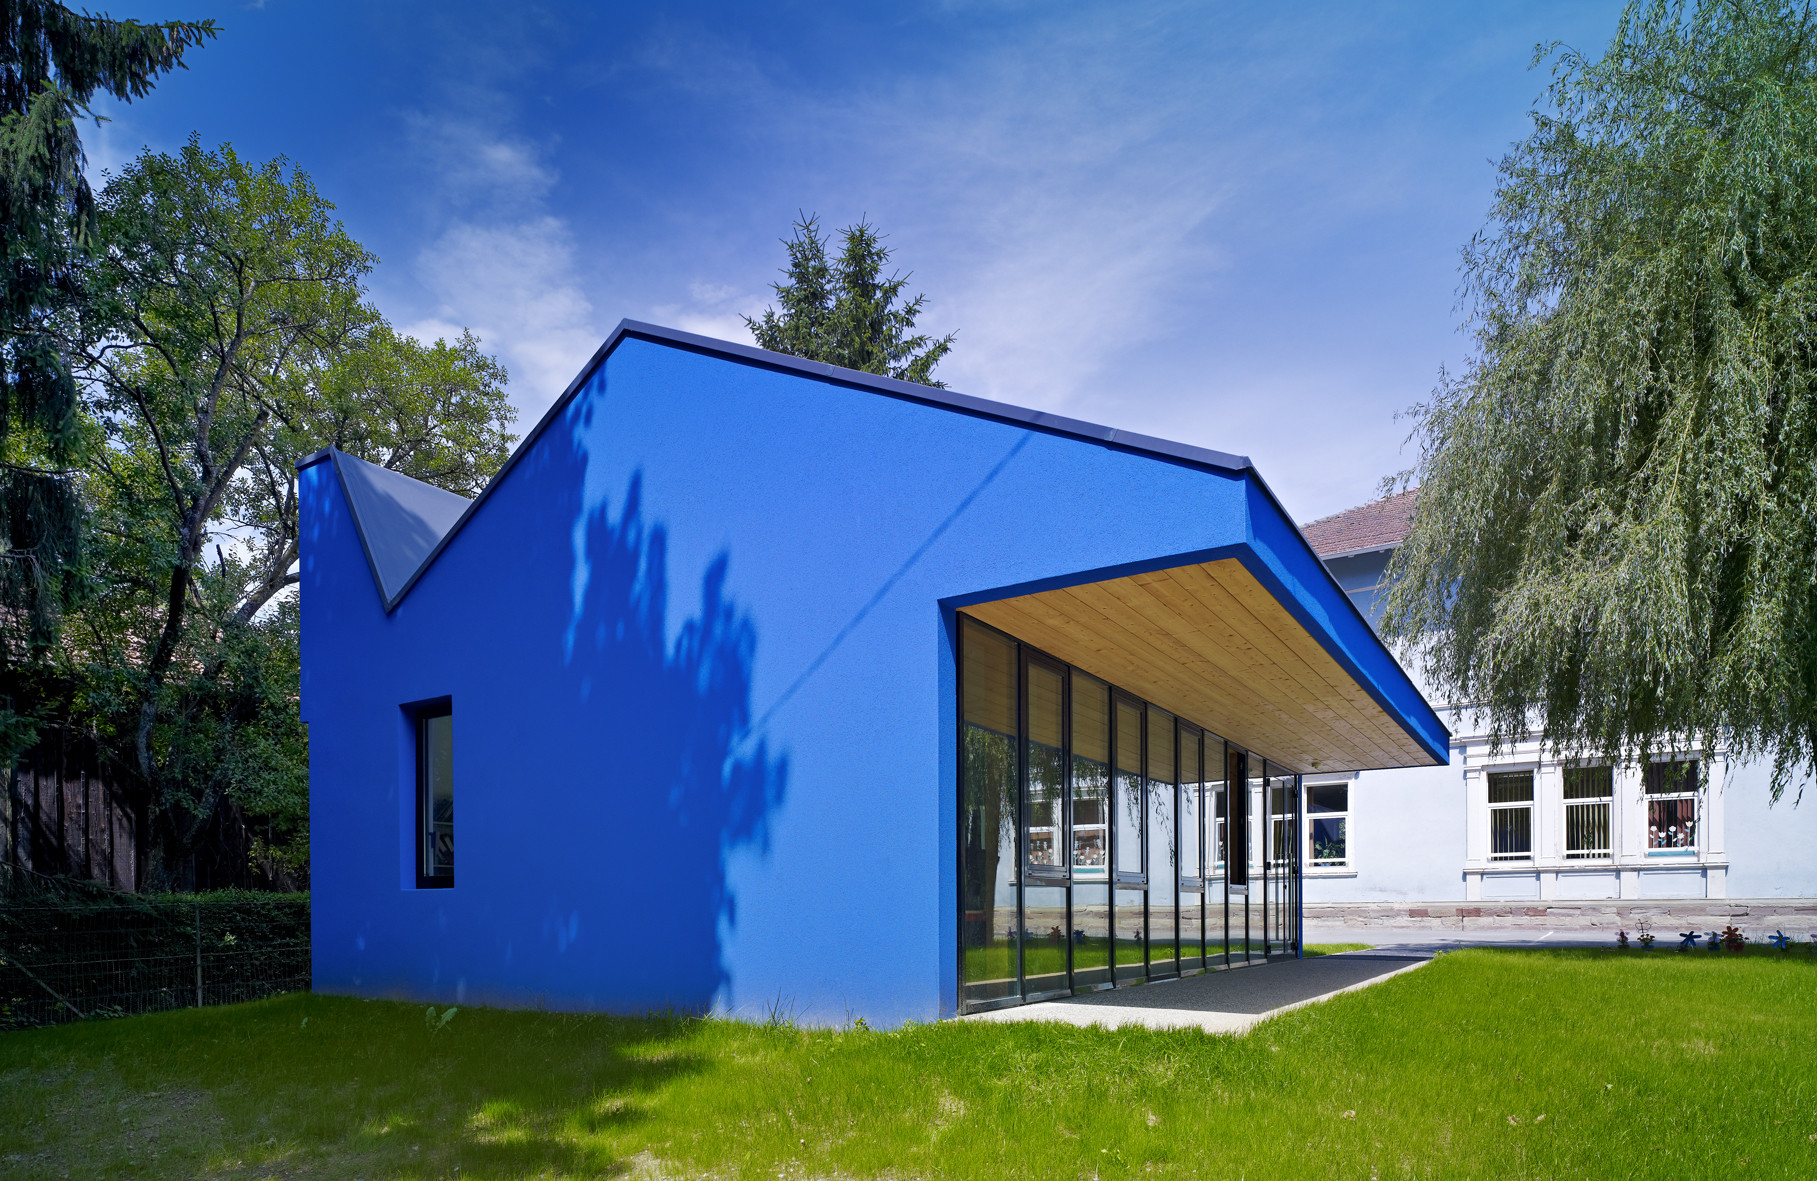 School Classroom / Loïc Picquet Architecte, © Stéphane Spach